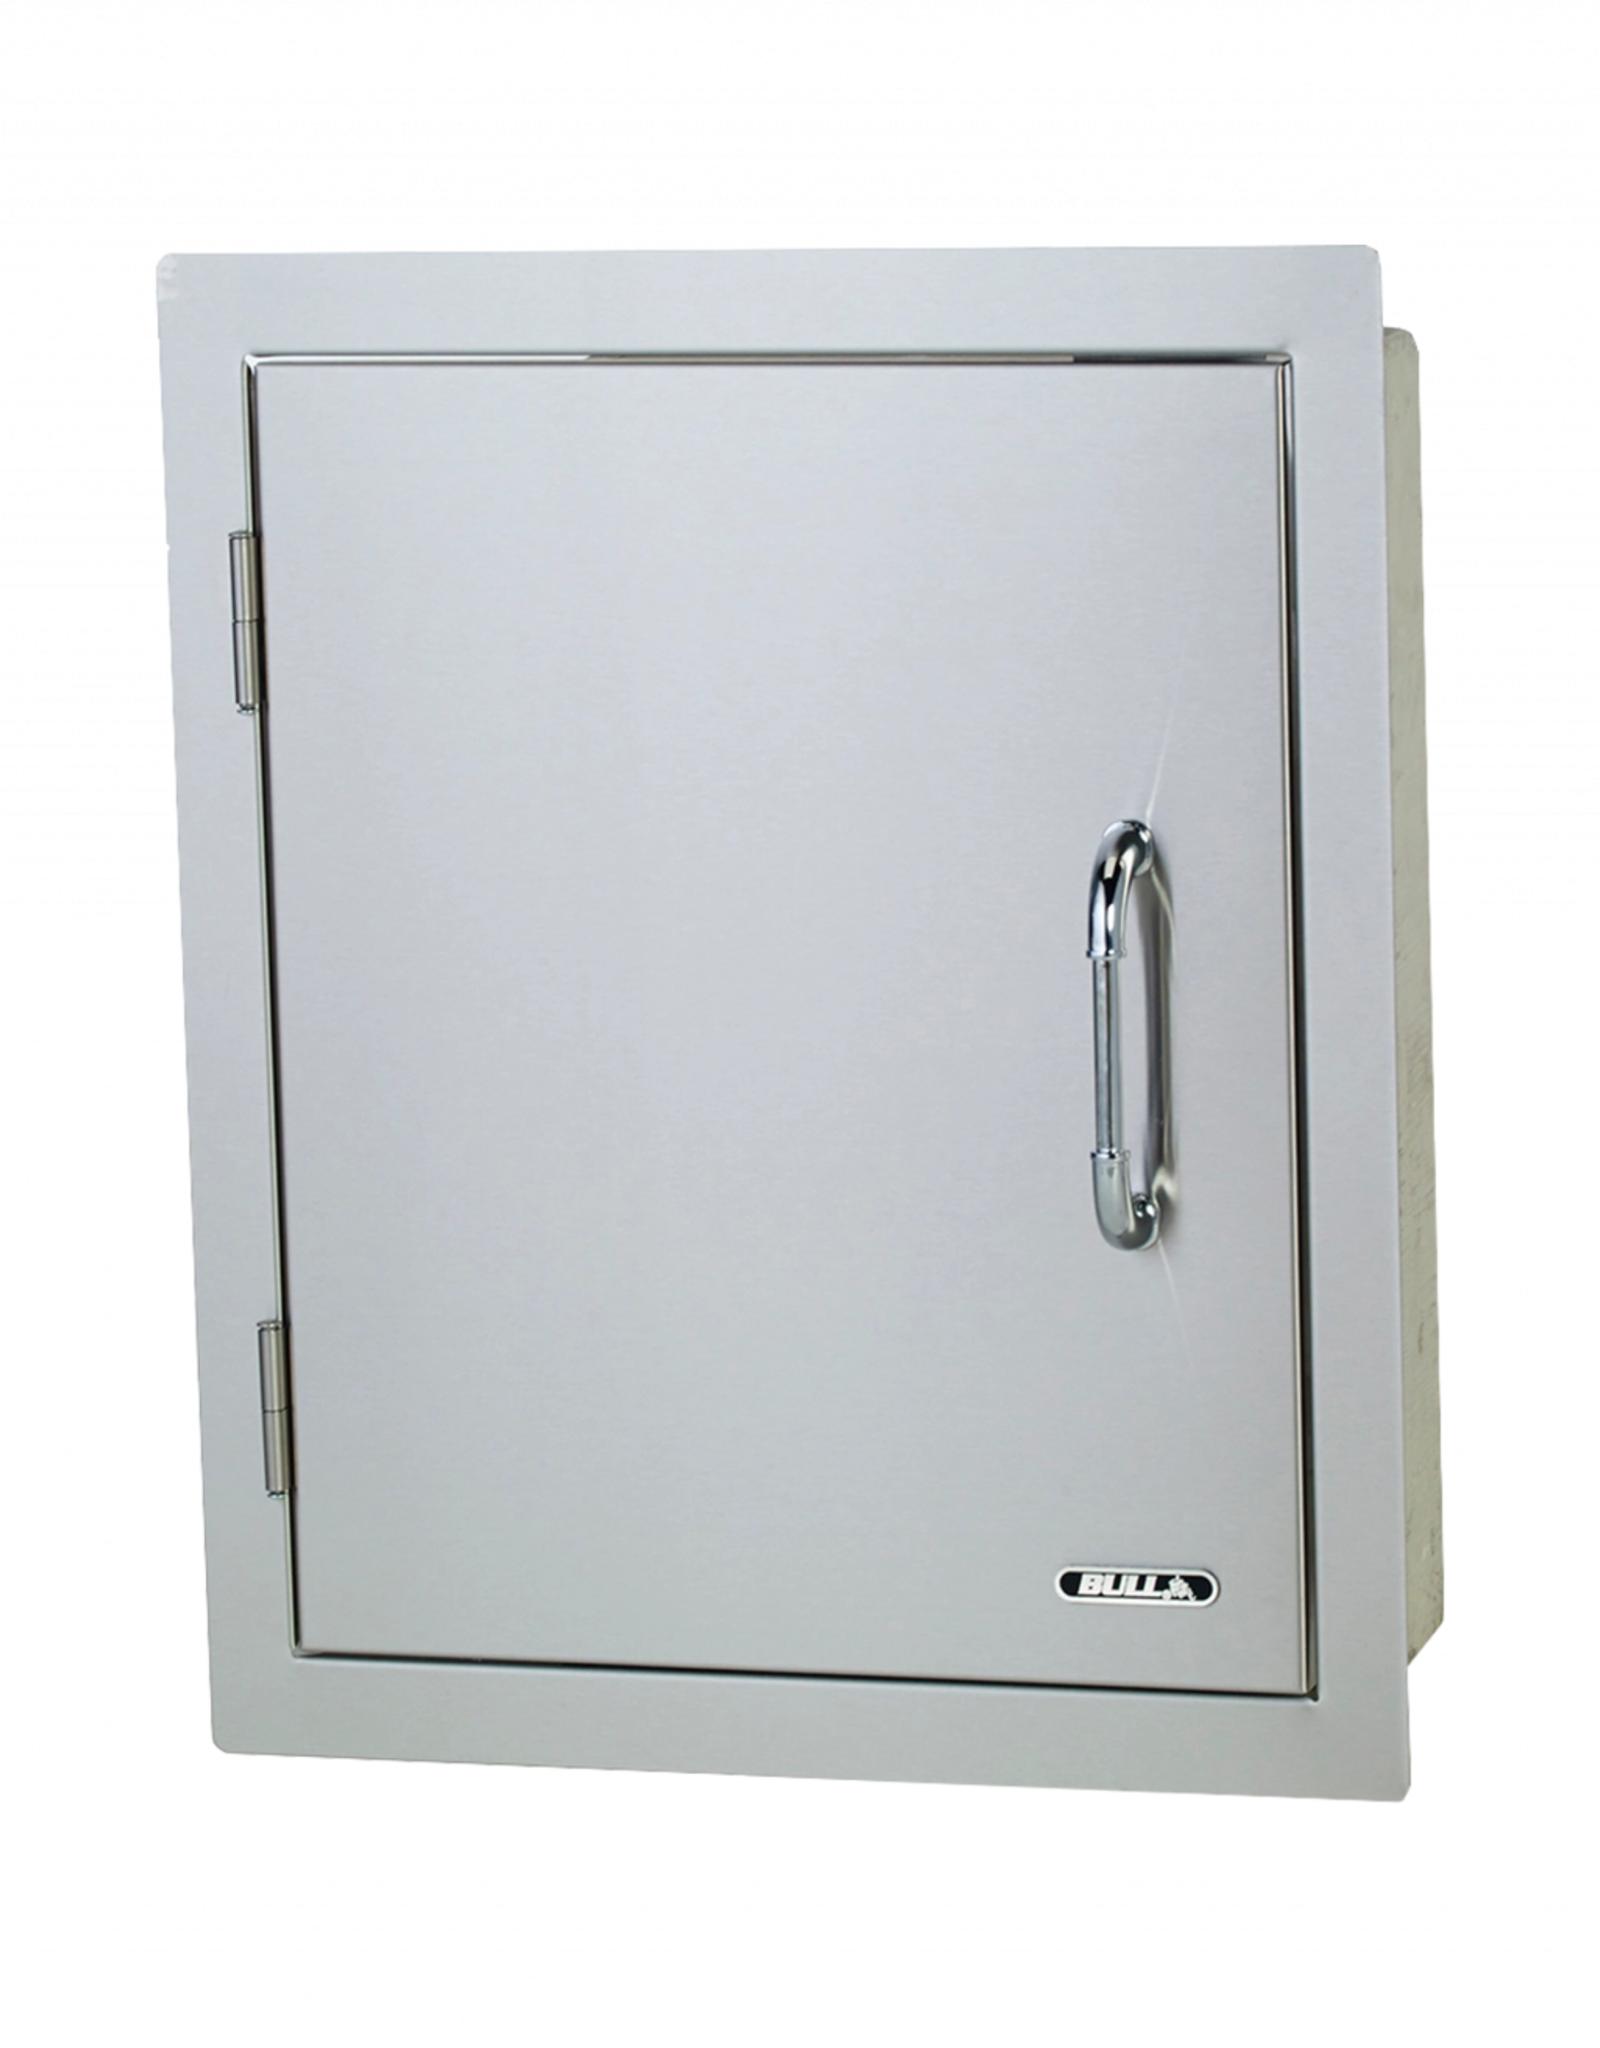 Bull Bull Vertical Access Door, Left Swing - 98552